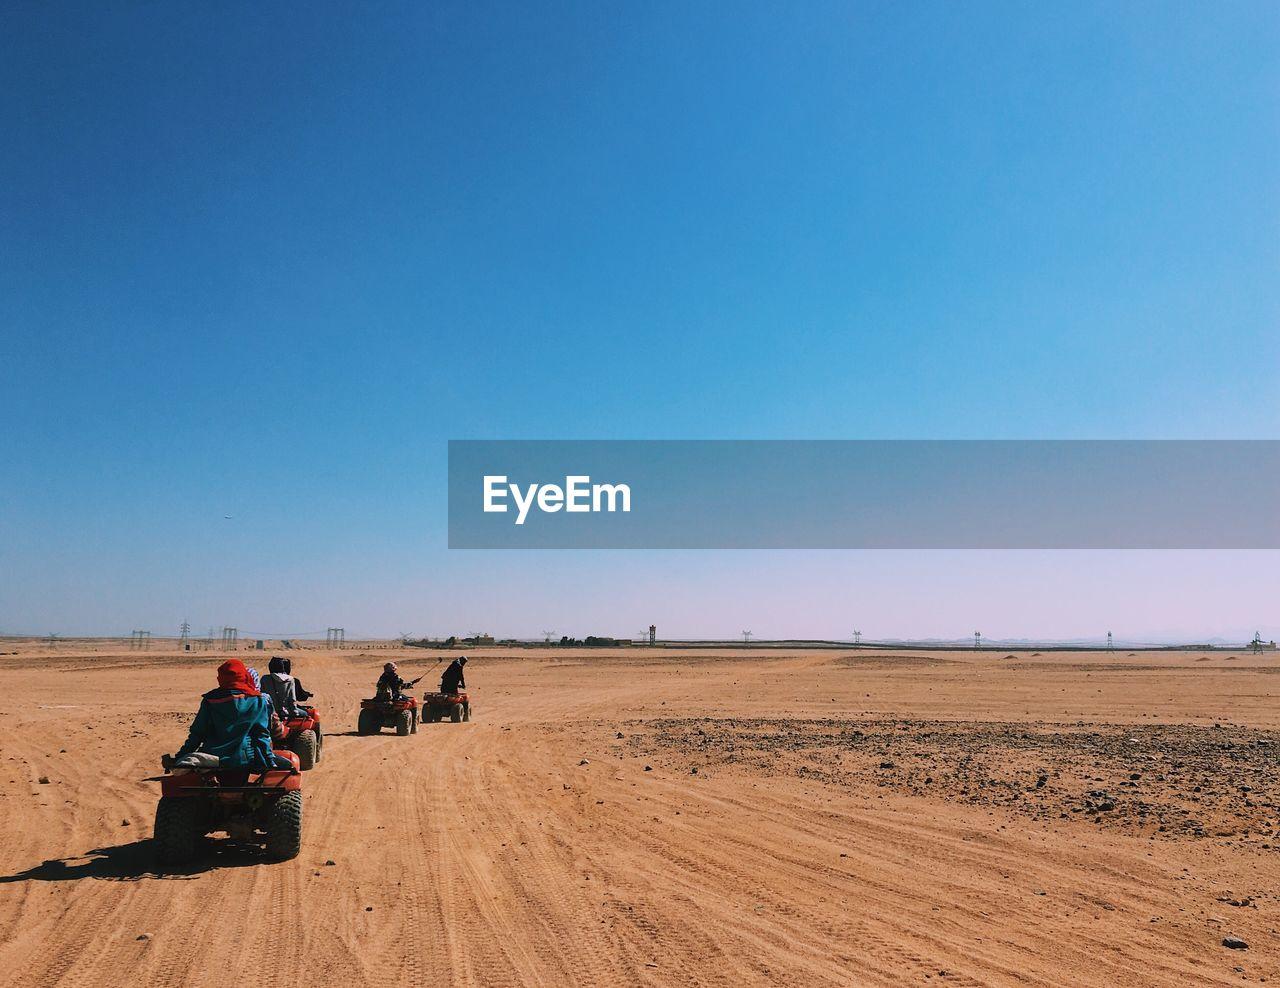 People On Buggies In Desert Against Clear Sky